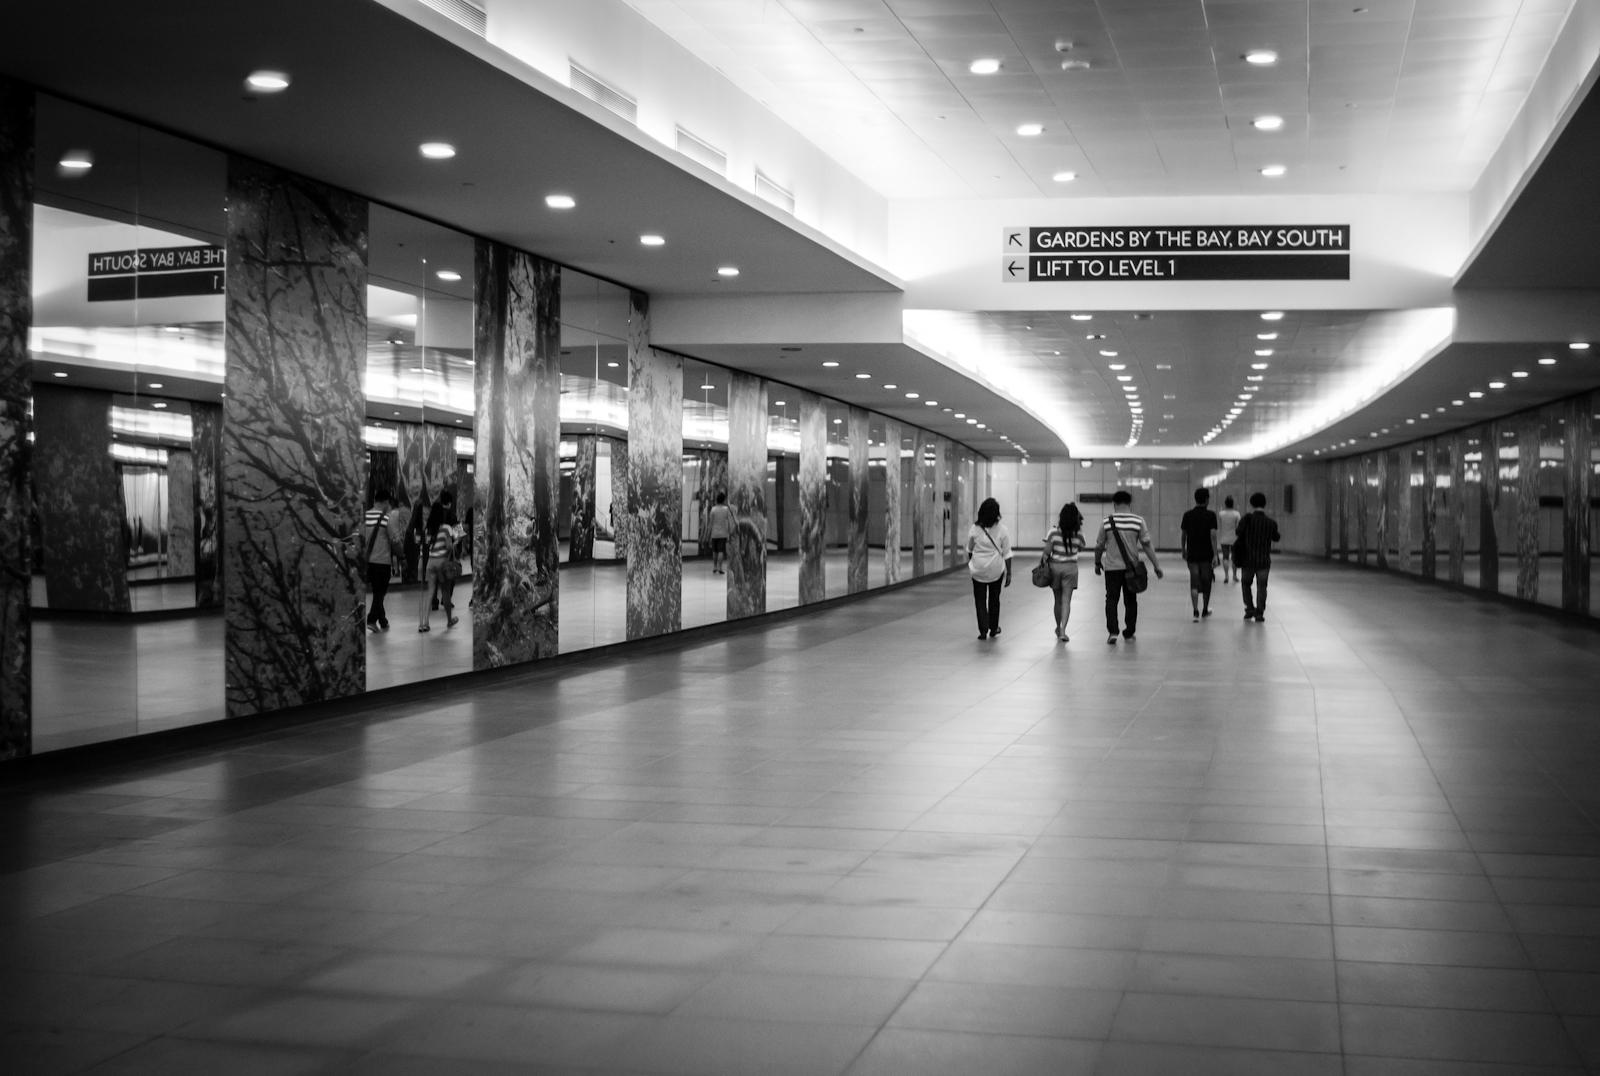 Underground passage in Singapore